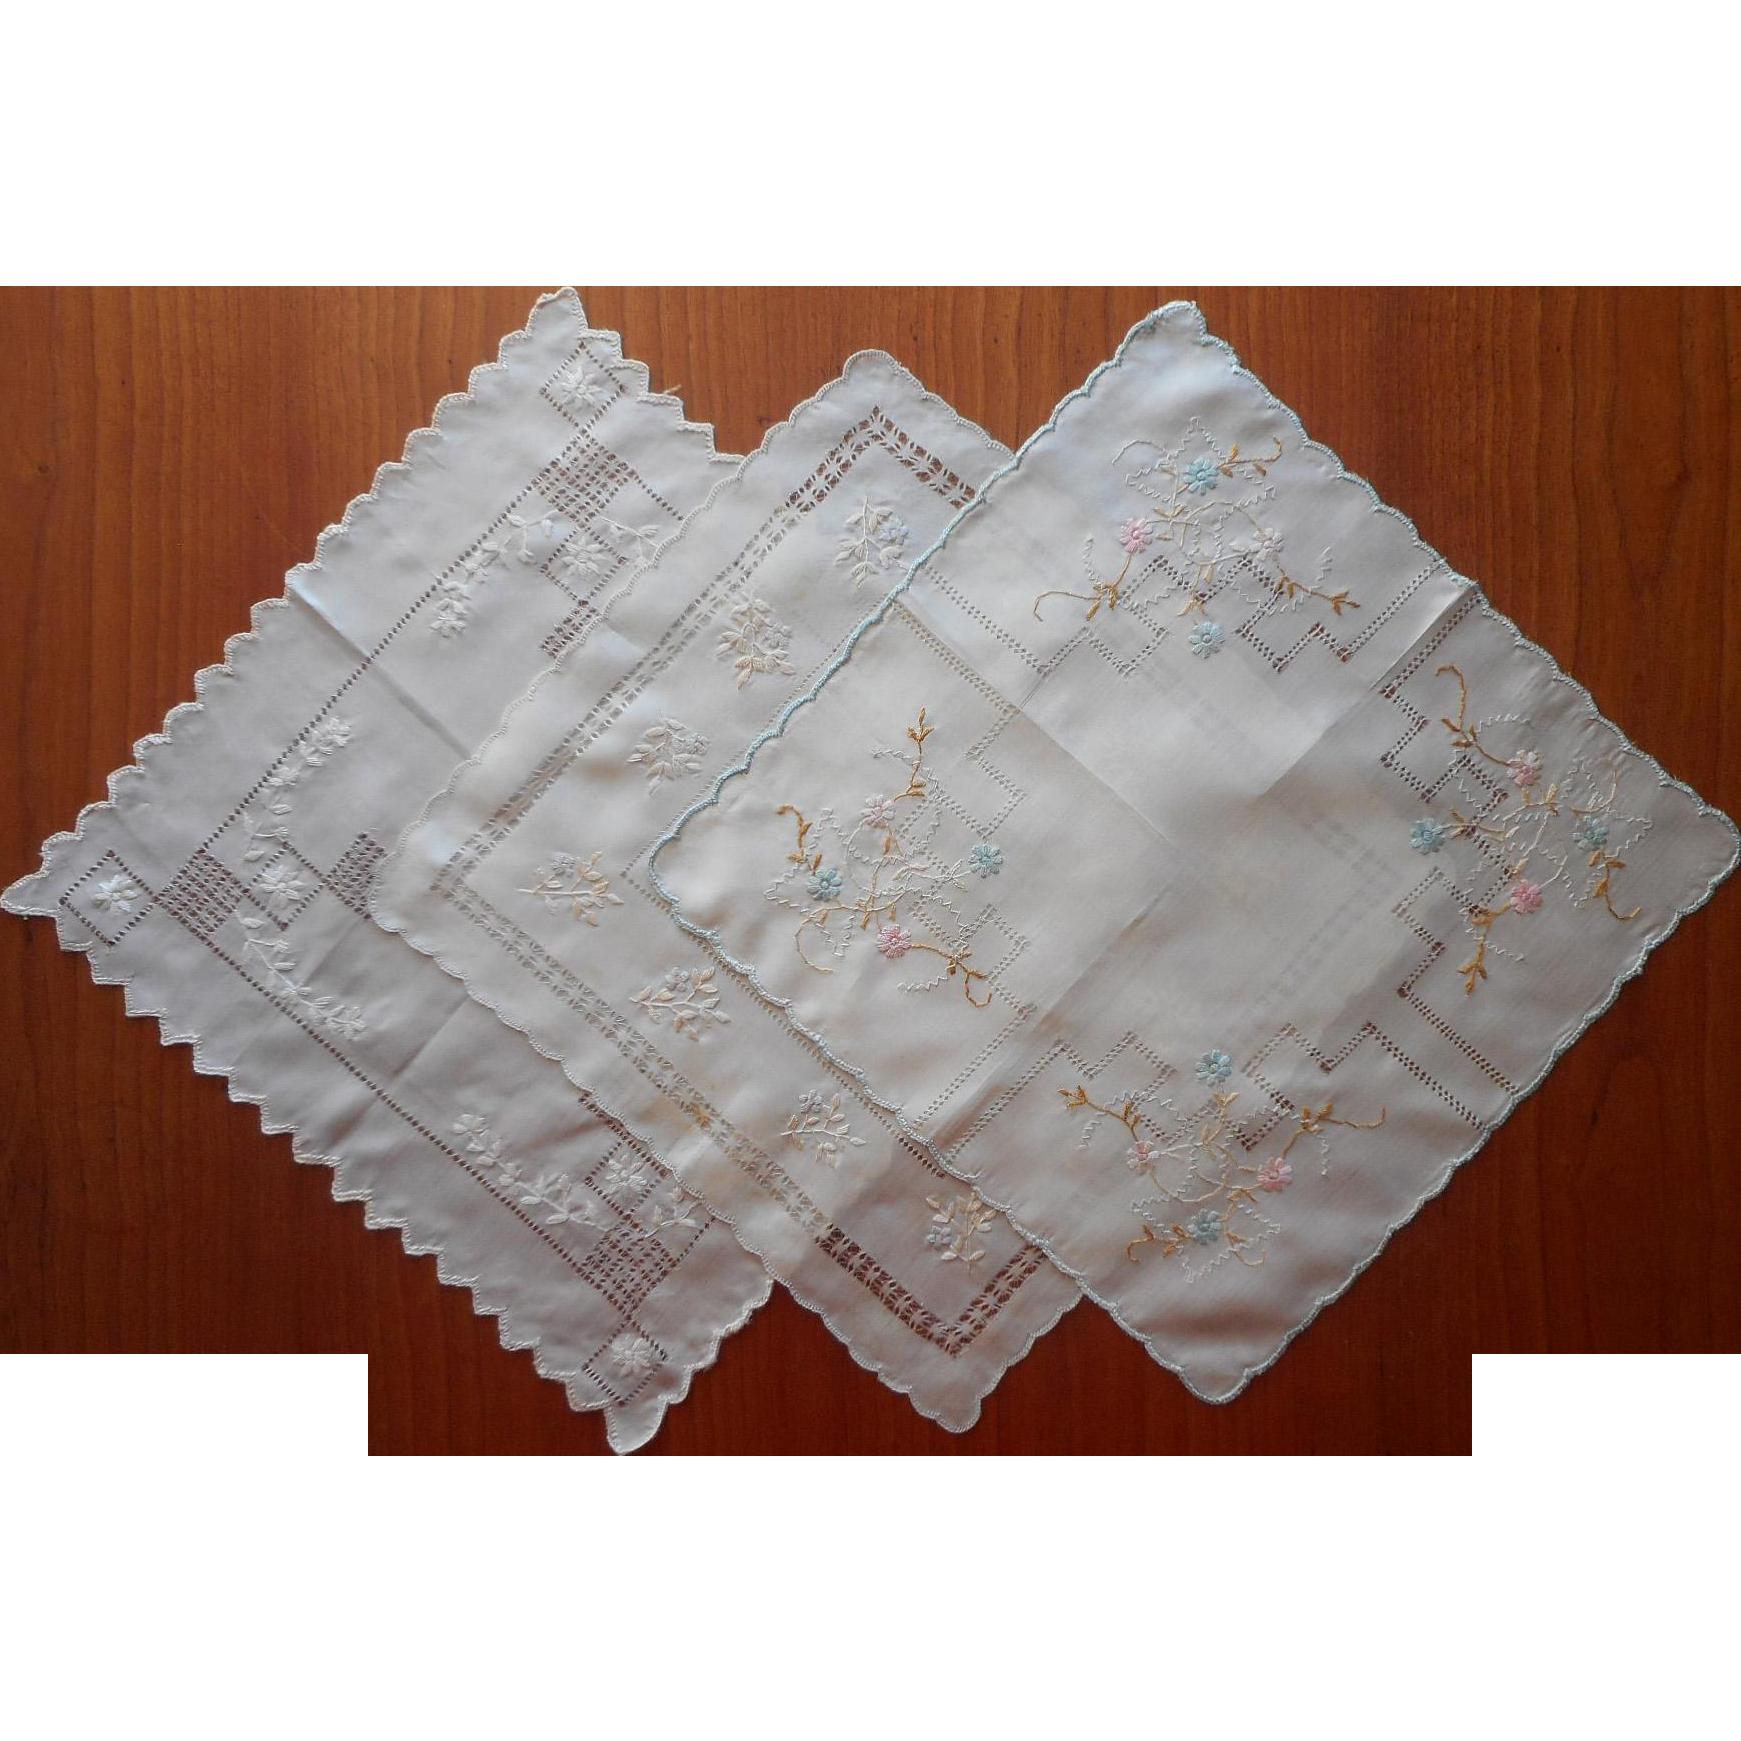 Antique Silk Hankies Hankie Set Of 3 Hand Embroidery Handkerchief